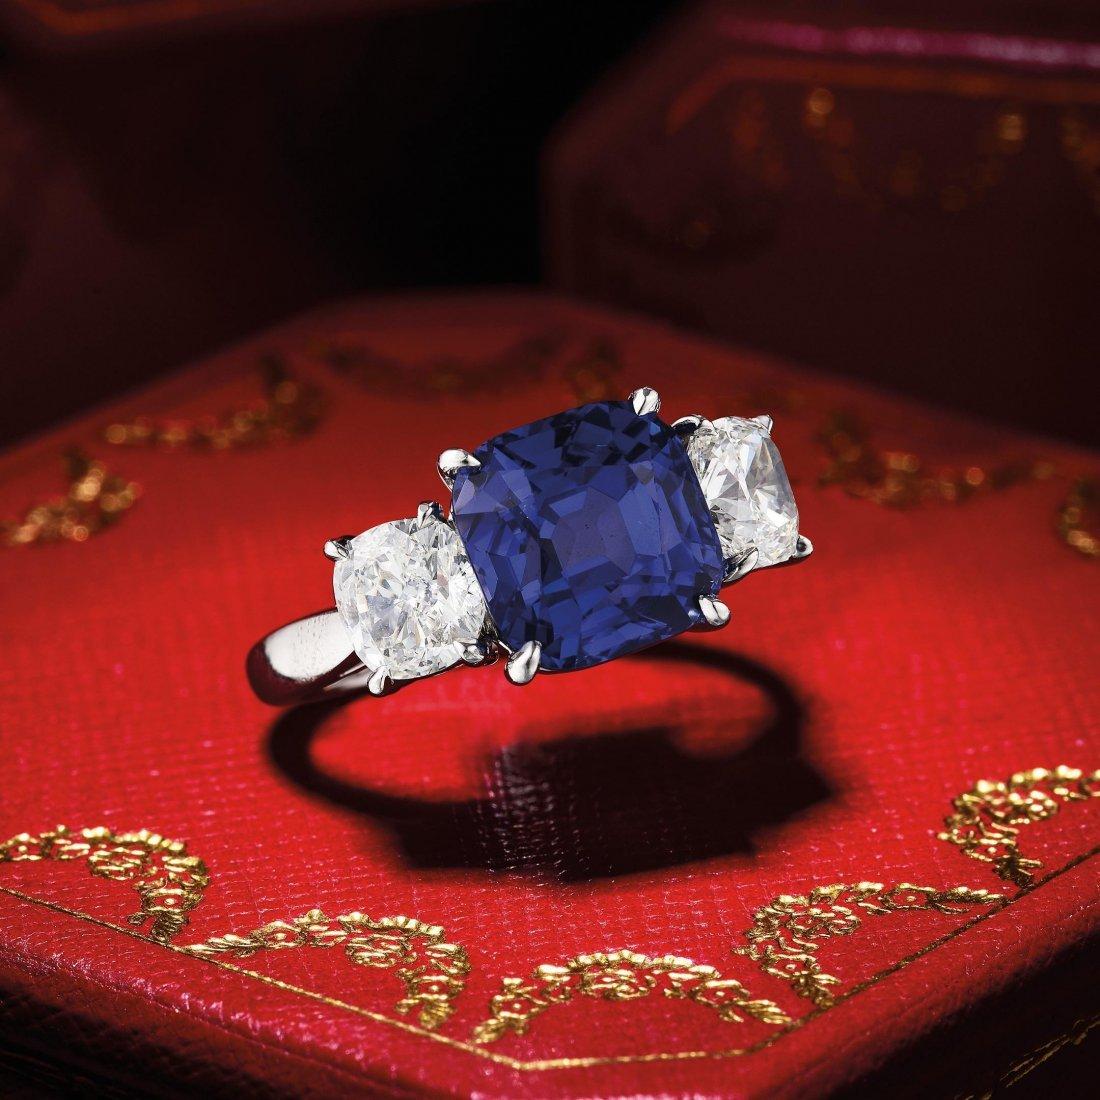 Cartier 6.69-Carat Burmese Sapphire and Diamond Ring